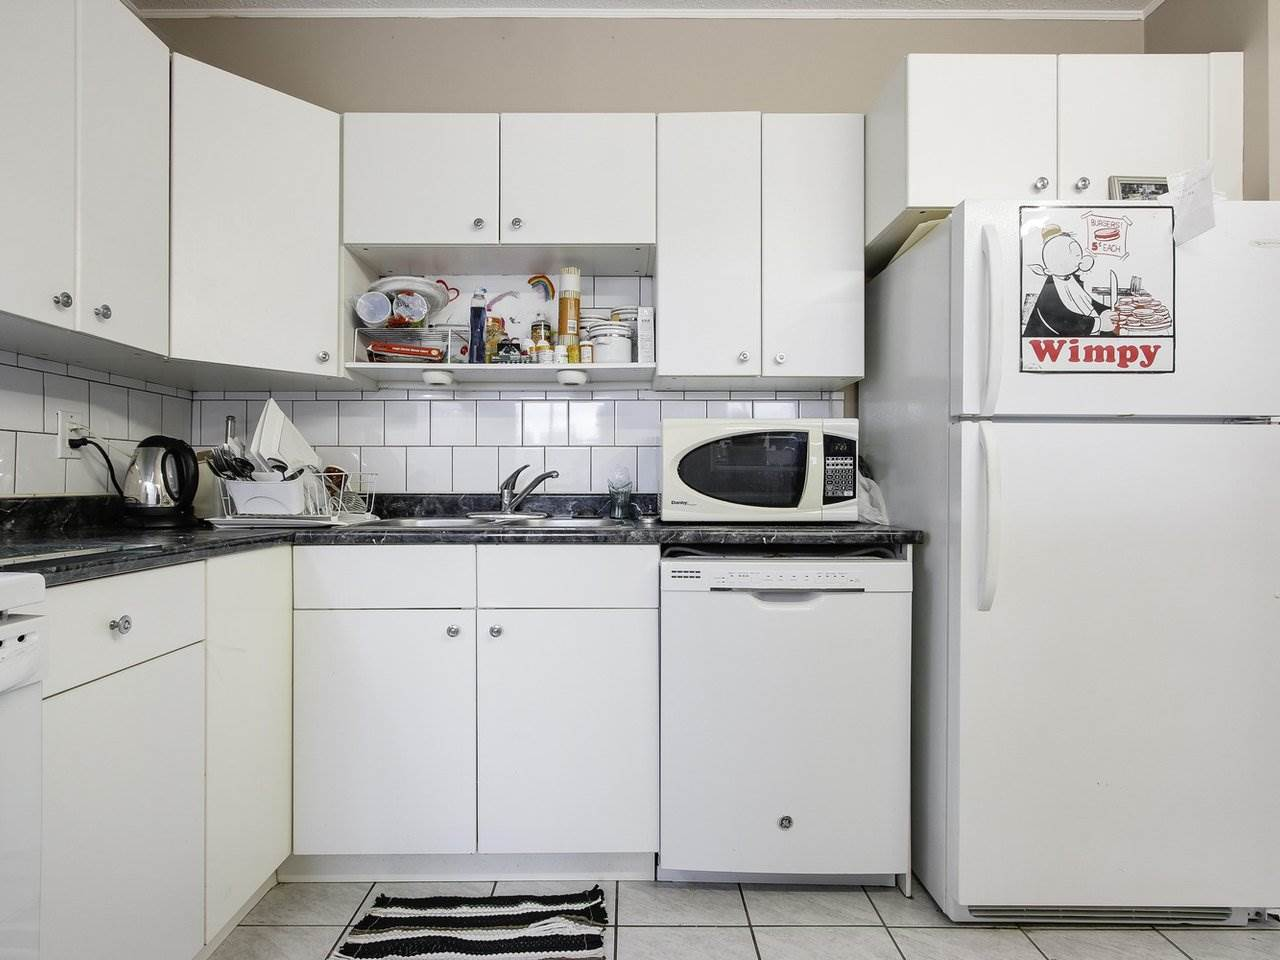 Condo Apartment at 905 3755 BARTLETT COURT, Unit 905, Burnaby North, British Columbia. Image 13